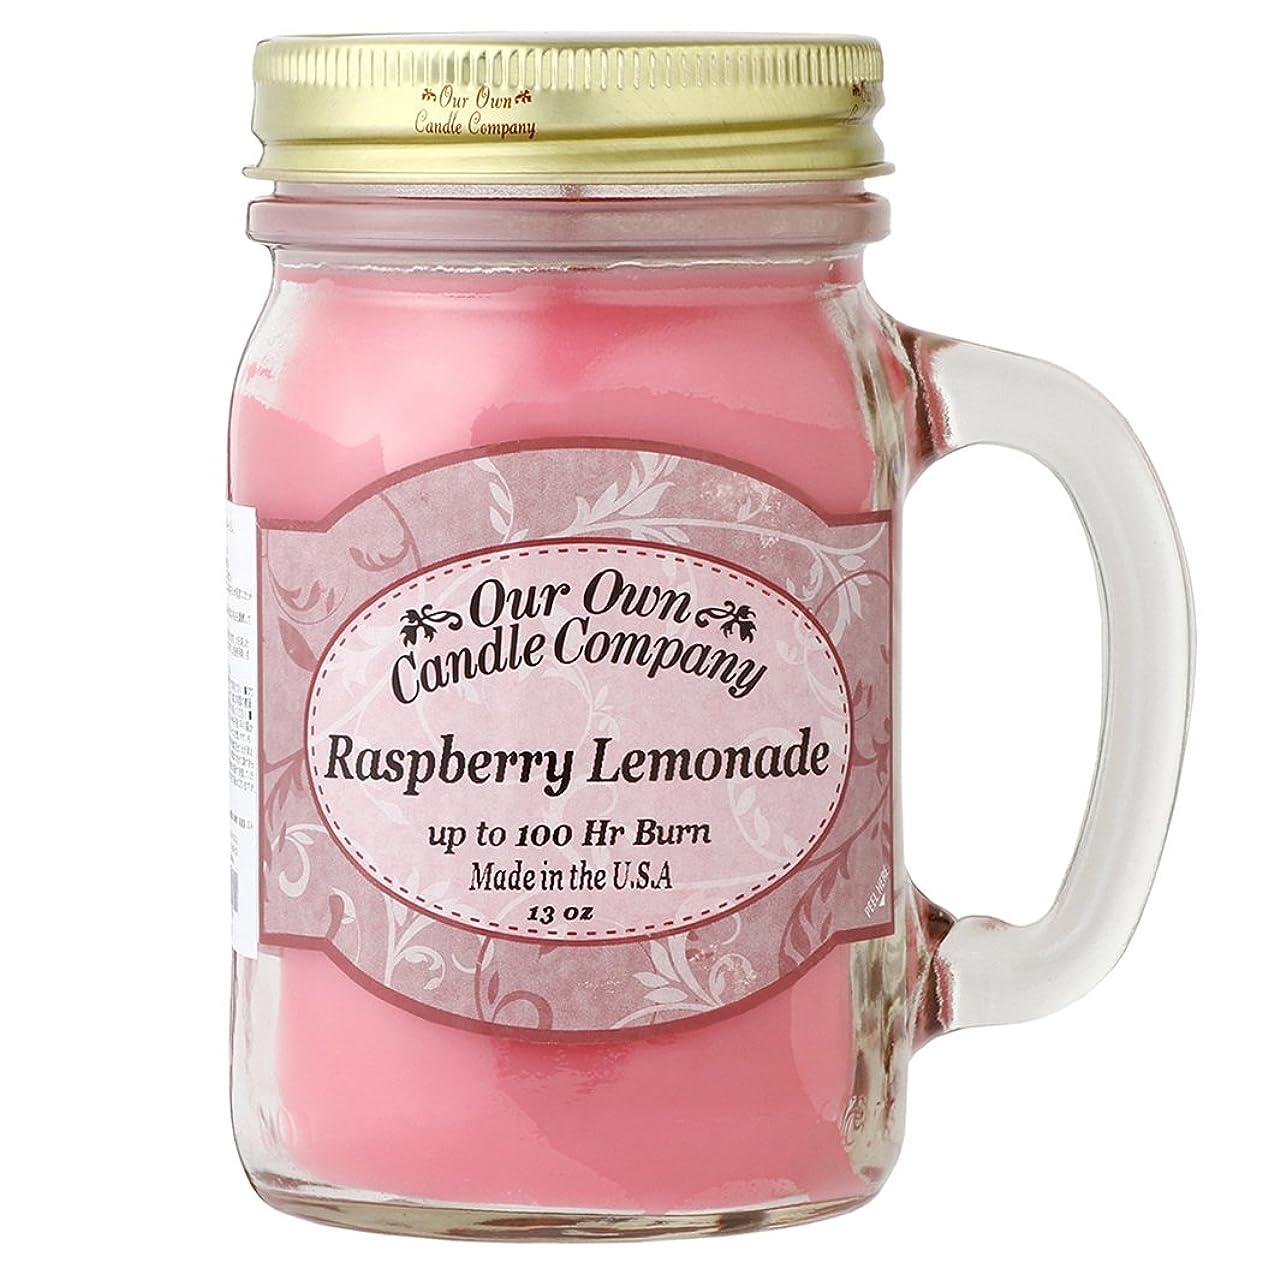 Our Own Candle Company メイソンジャーキャンドル ラージサイズ ラズベリーレモネード OU100096